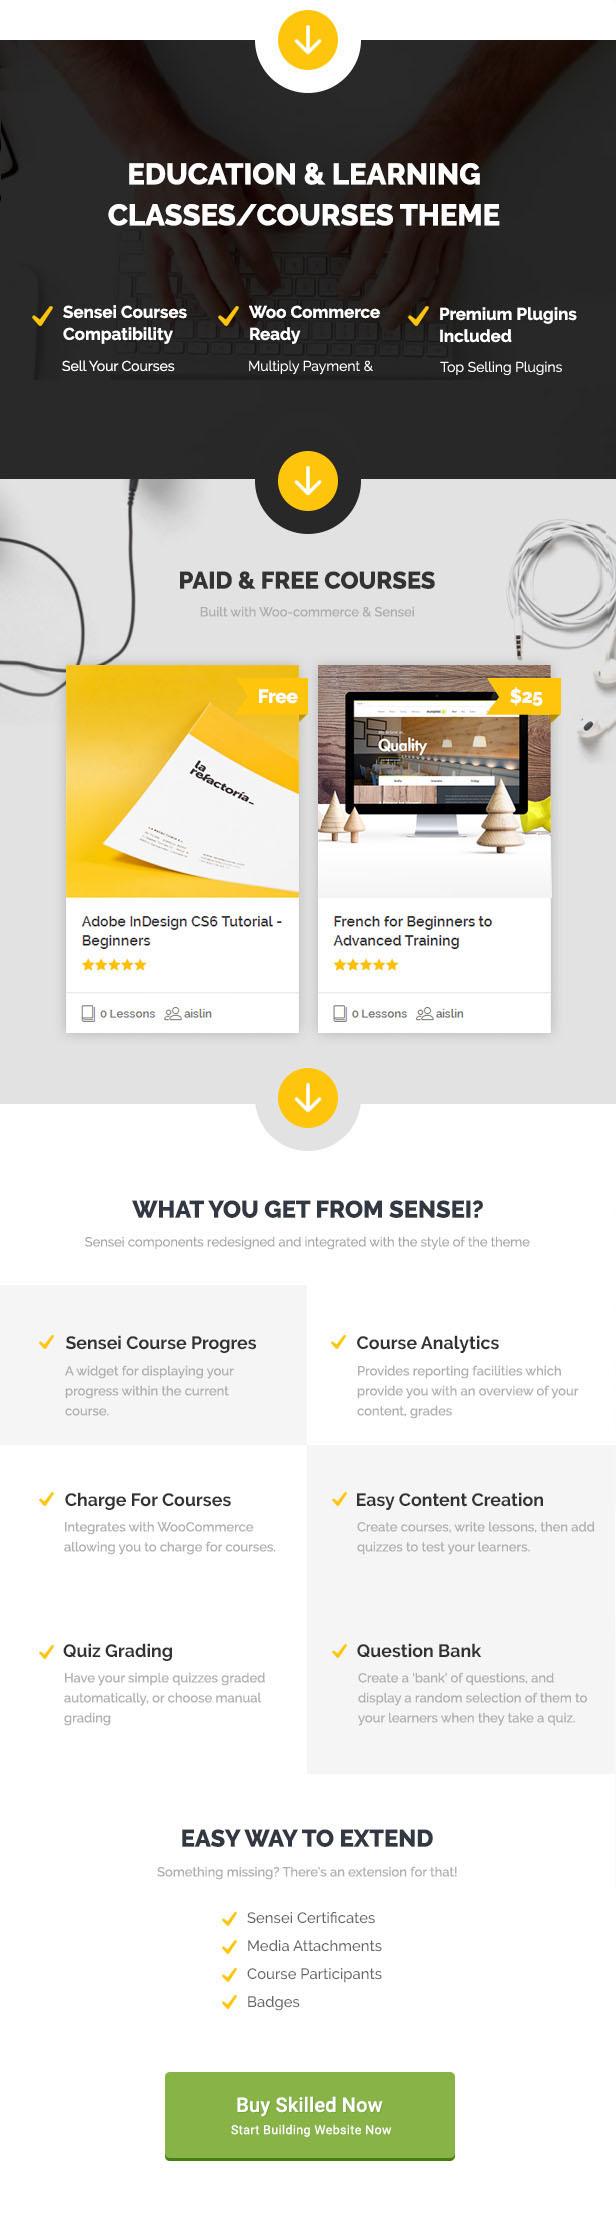 skilled 01 buy - Skilled | School Education Courses WordPress Theme